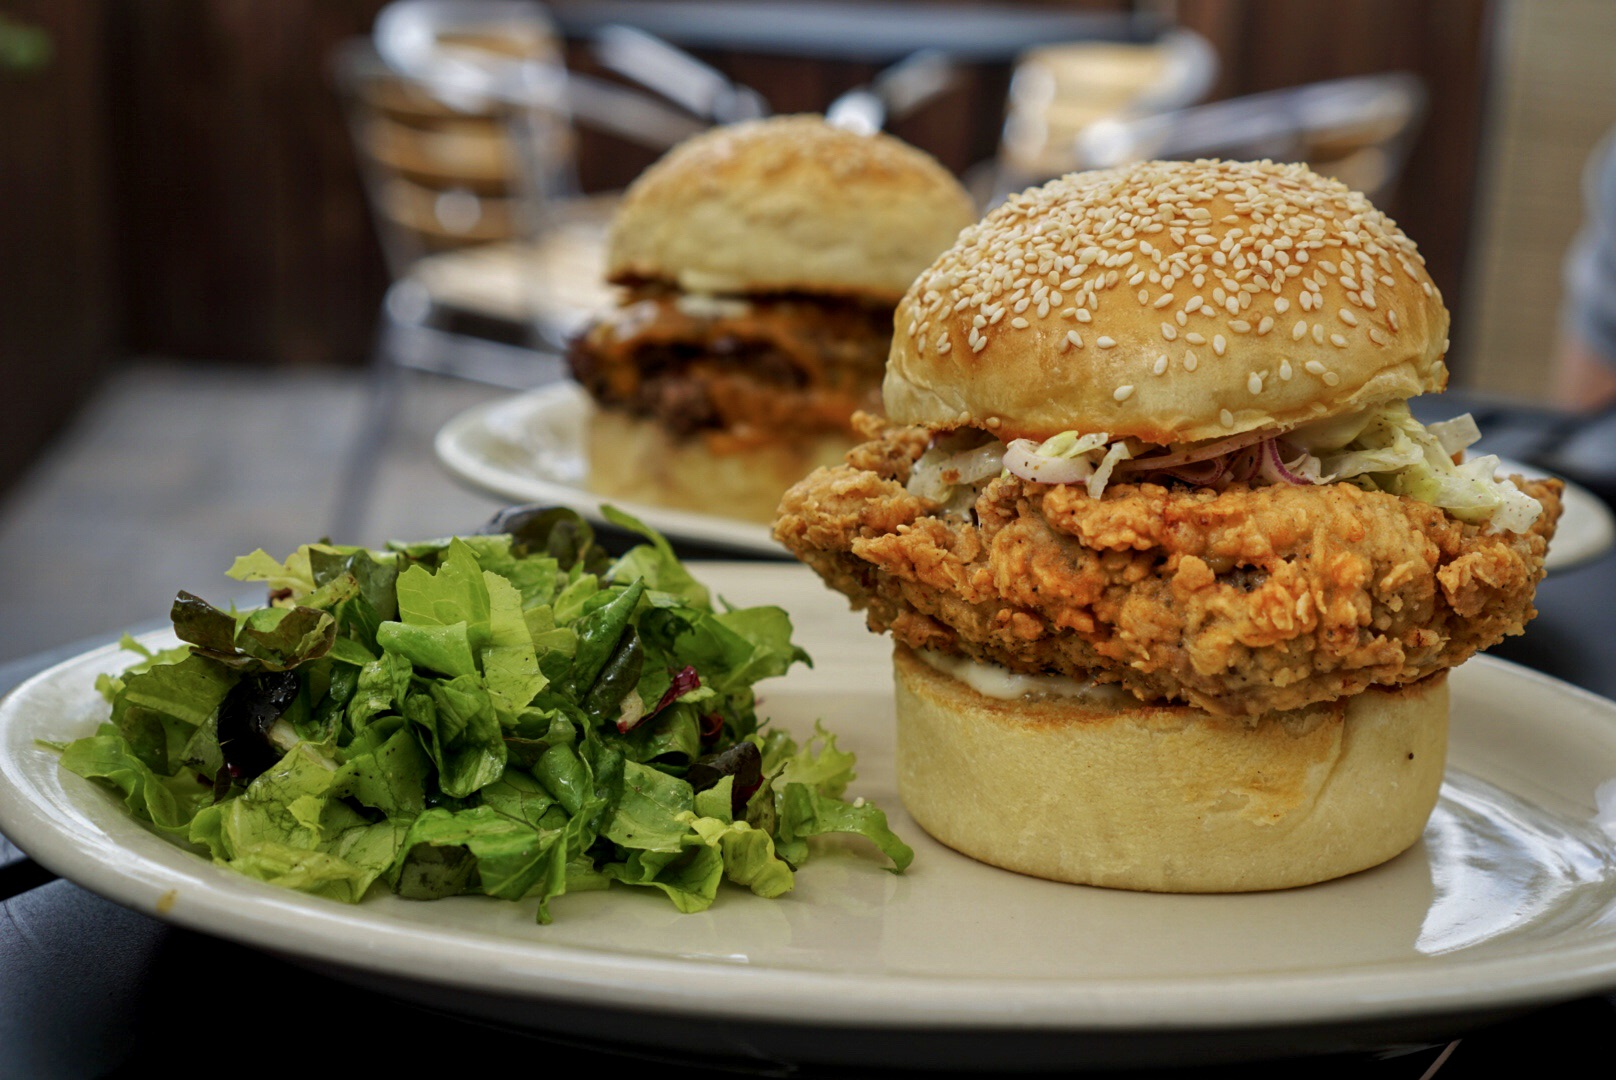 Proof Miami Chicken Sandwich and Burger